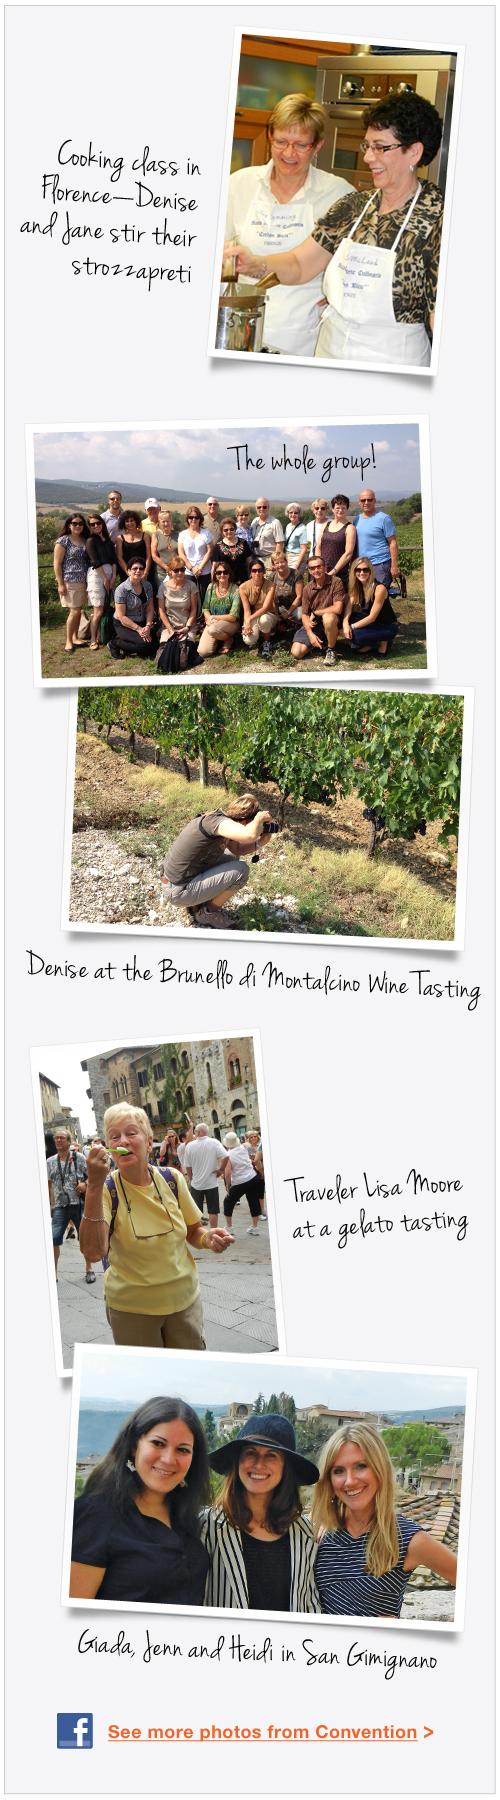 Taste of Tuscany and Umbria Tour, Italy